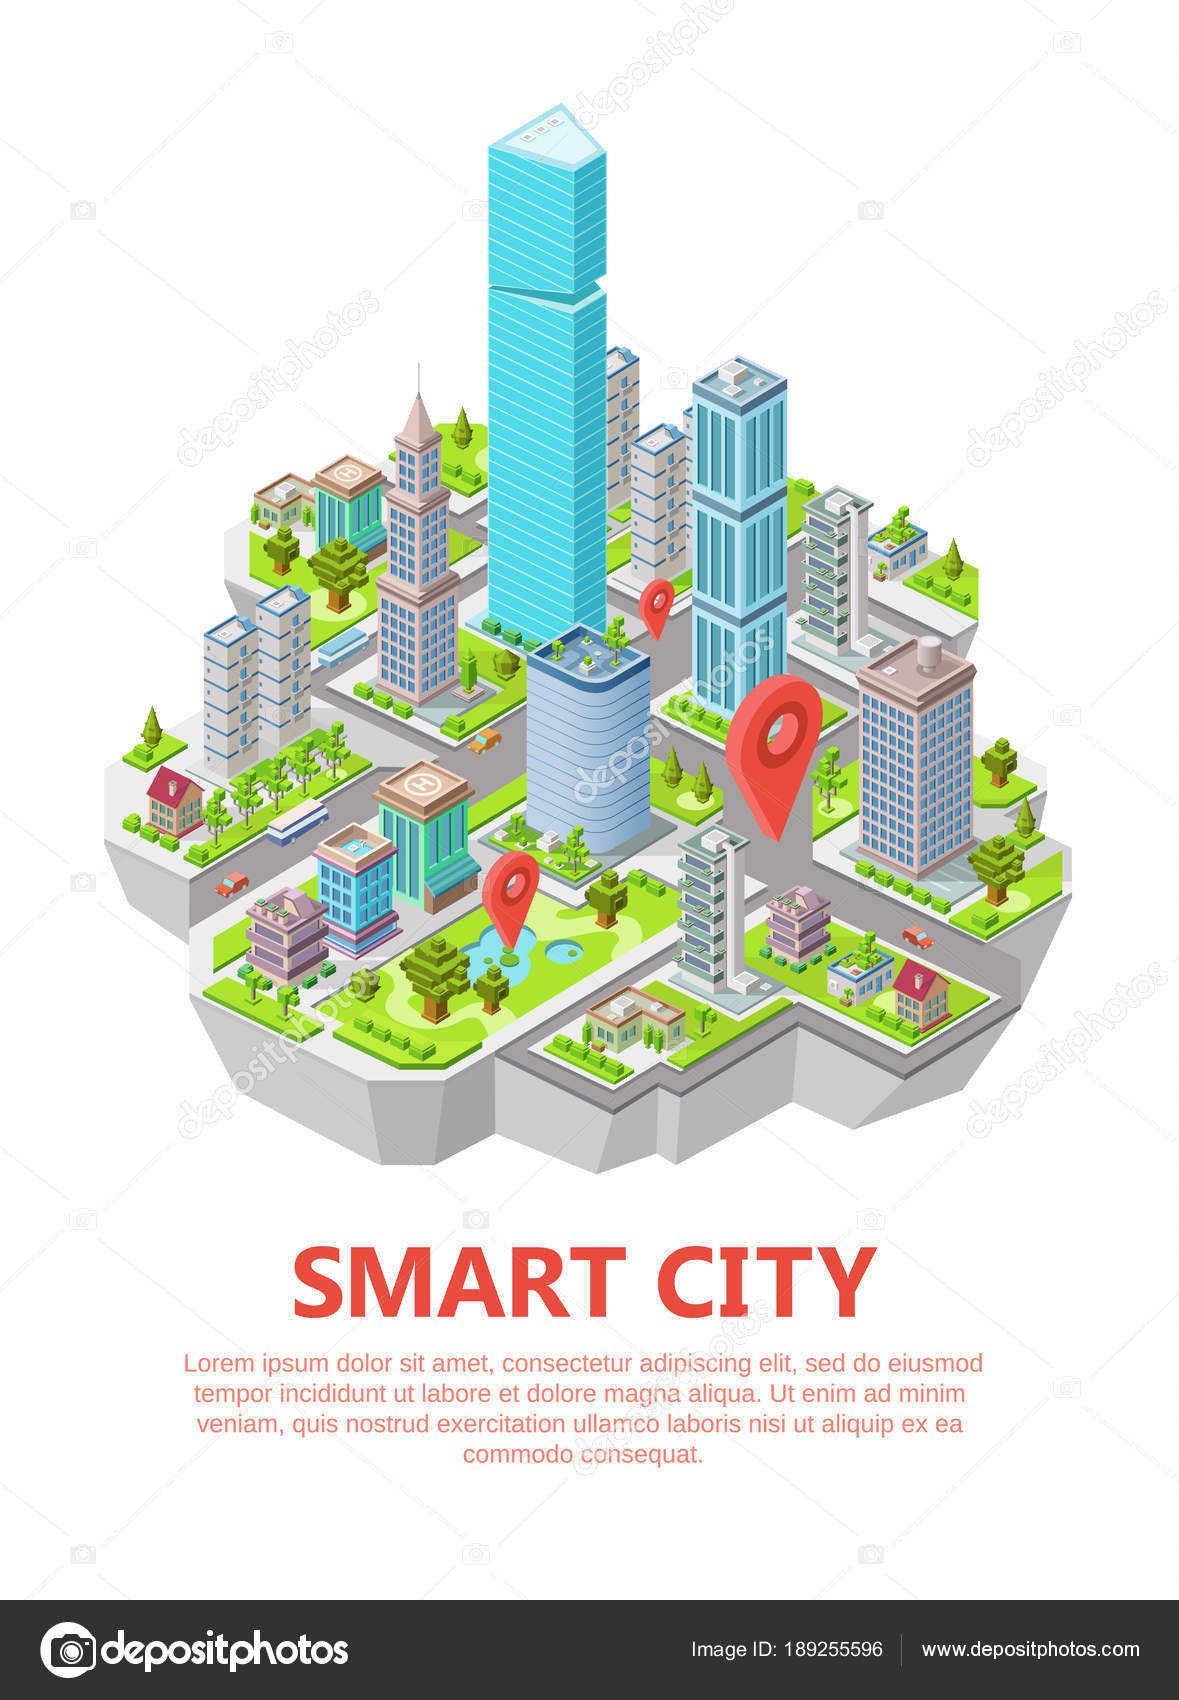 Isometric smart city vector illustration 3d residential